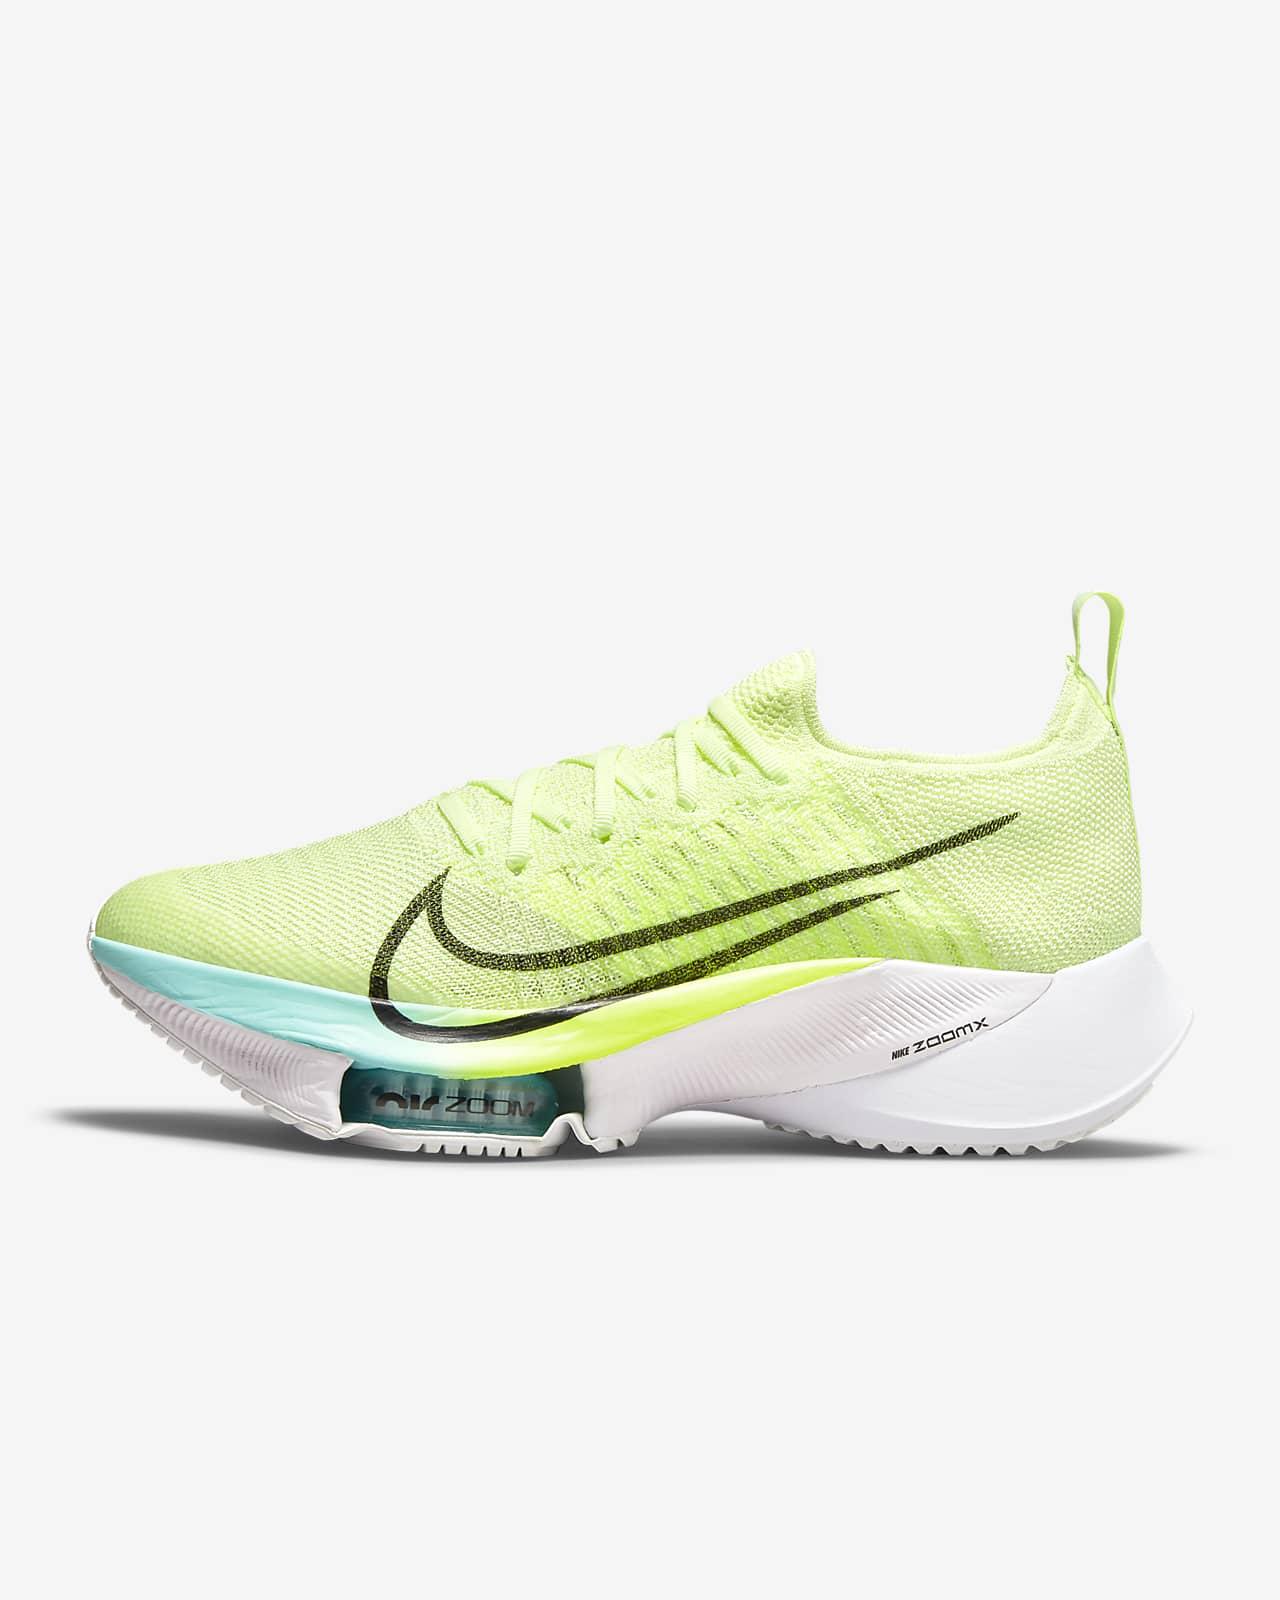 Damskie buty do biegania po asfalcie Nike Air Zoom Tempo NEXT%